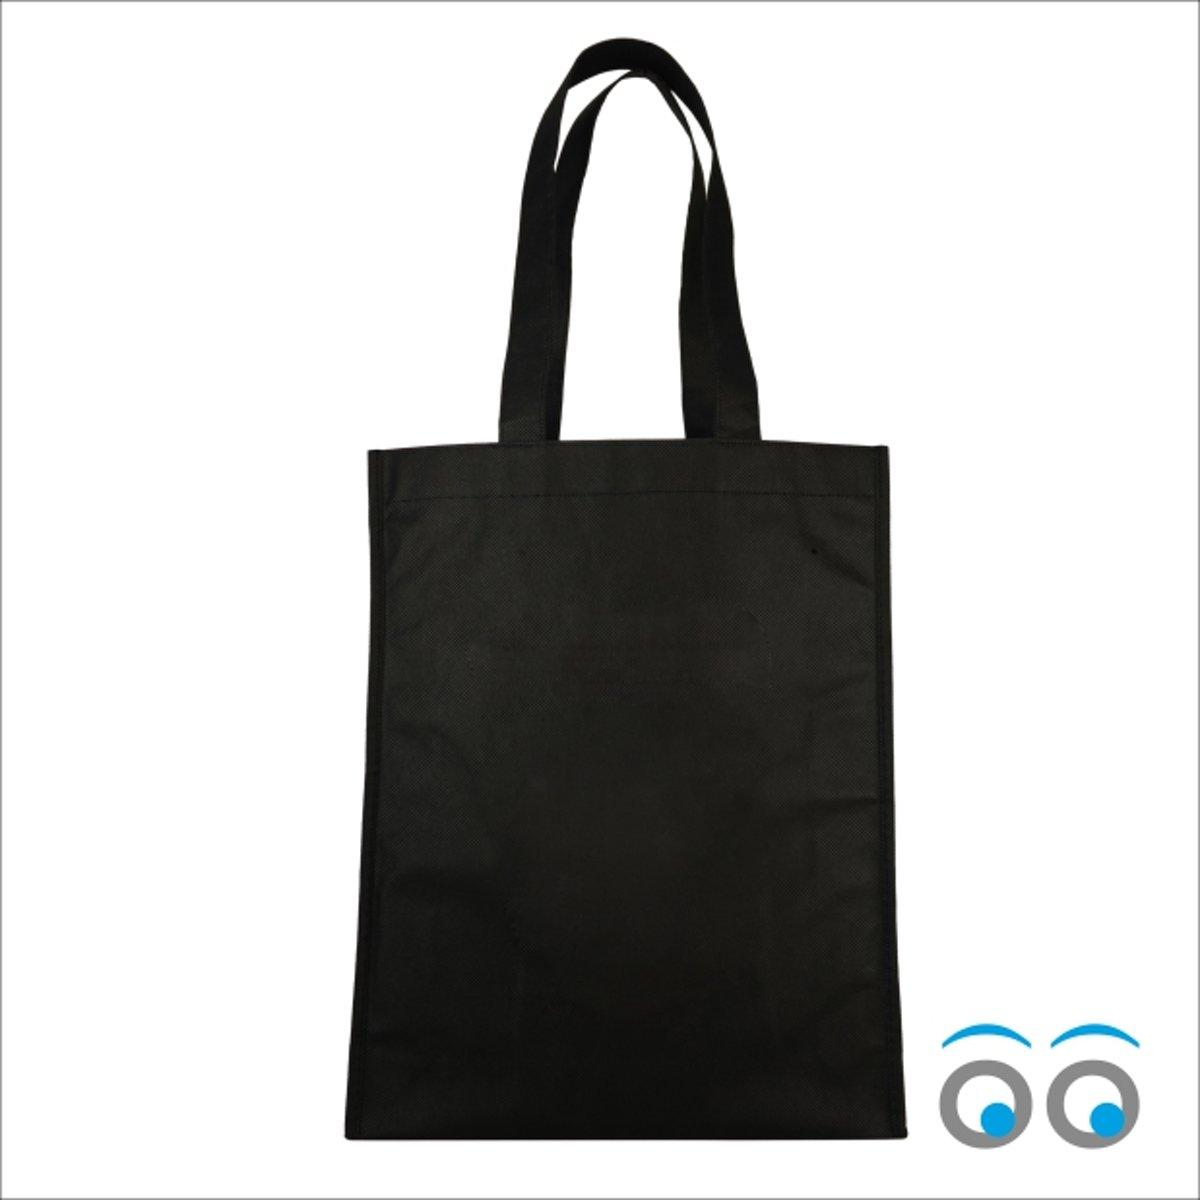 10 stuks katoenen tassen zwart (40 x 32 cm) kopen